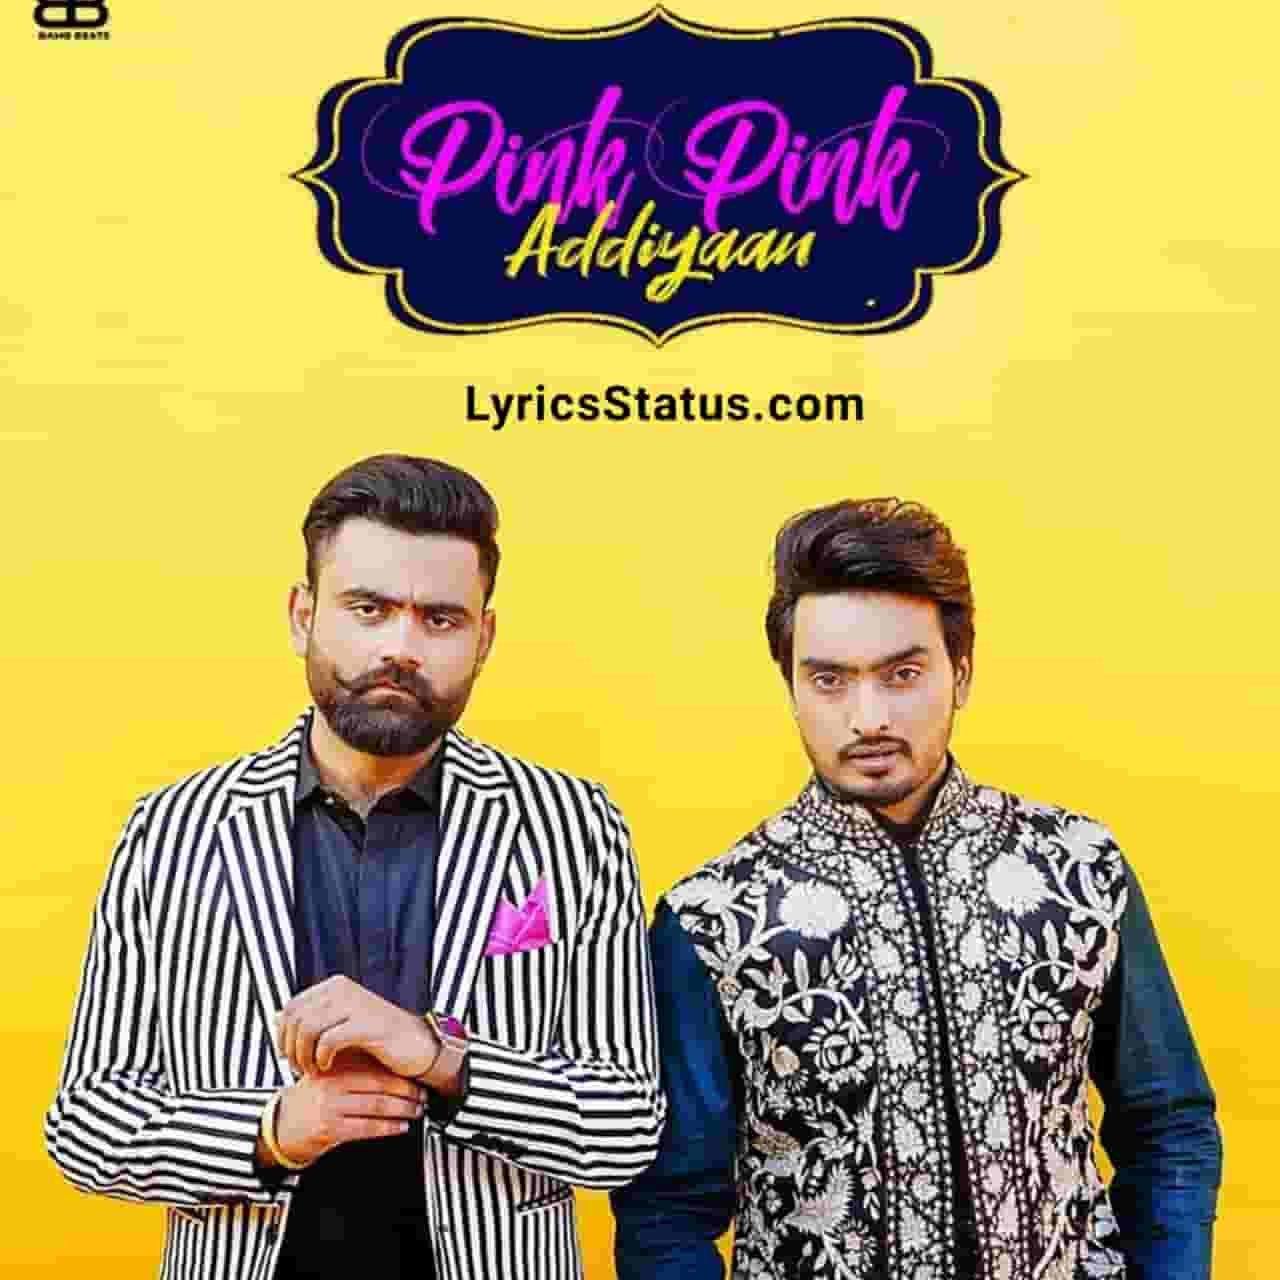 Jigar Pink Pink Addiyaan Amrit Maan Lyrics Status Download Punjabi Song Pink pink addiyaan nu laide jhanjran Ve jatta laal laal akh waaleyastatus